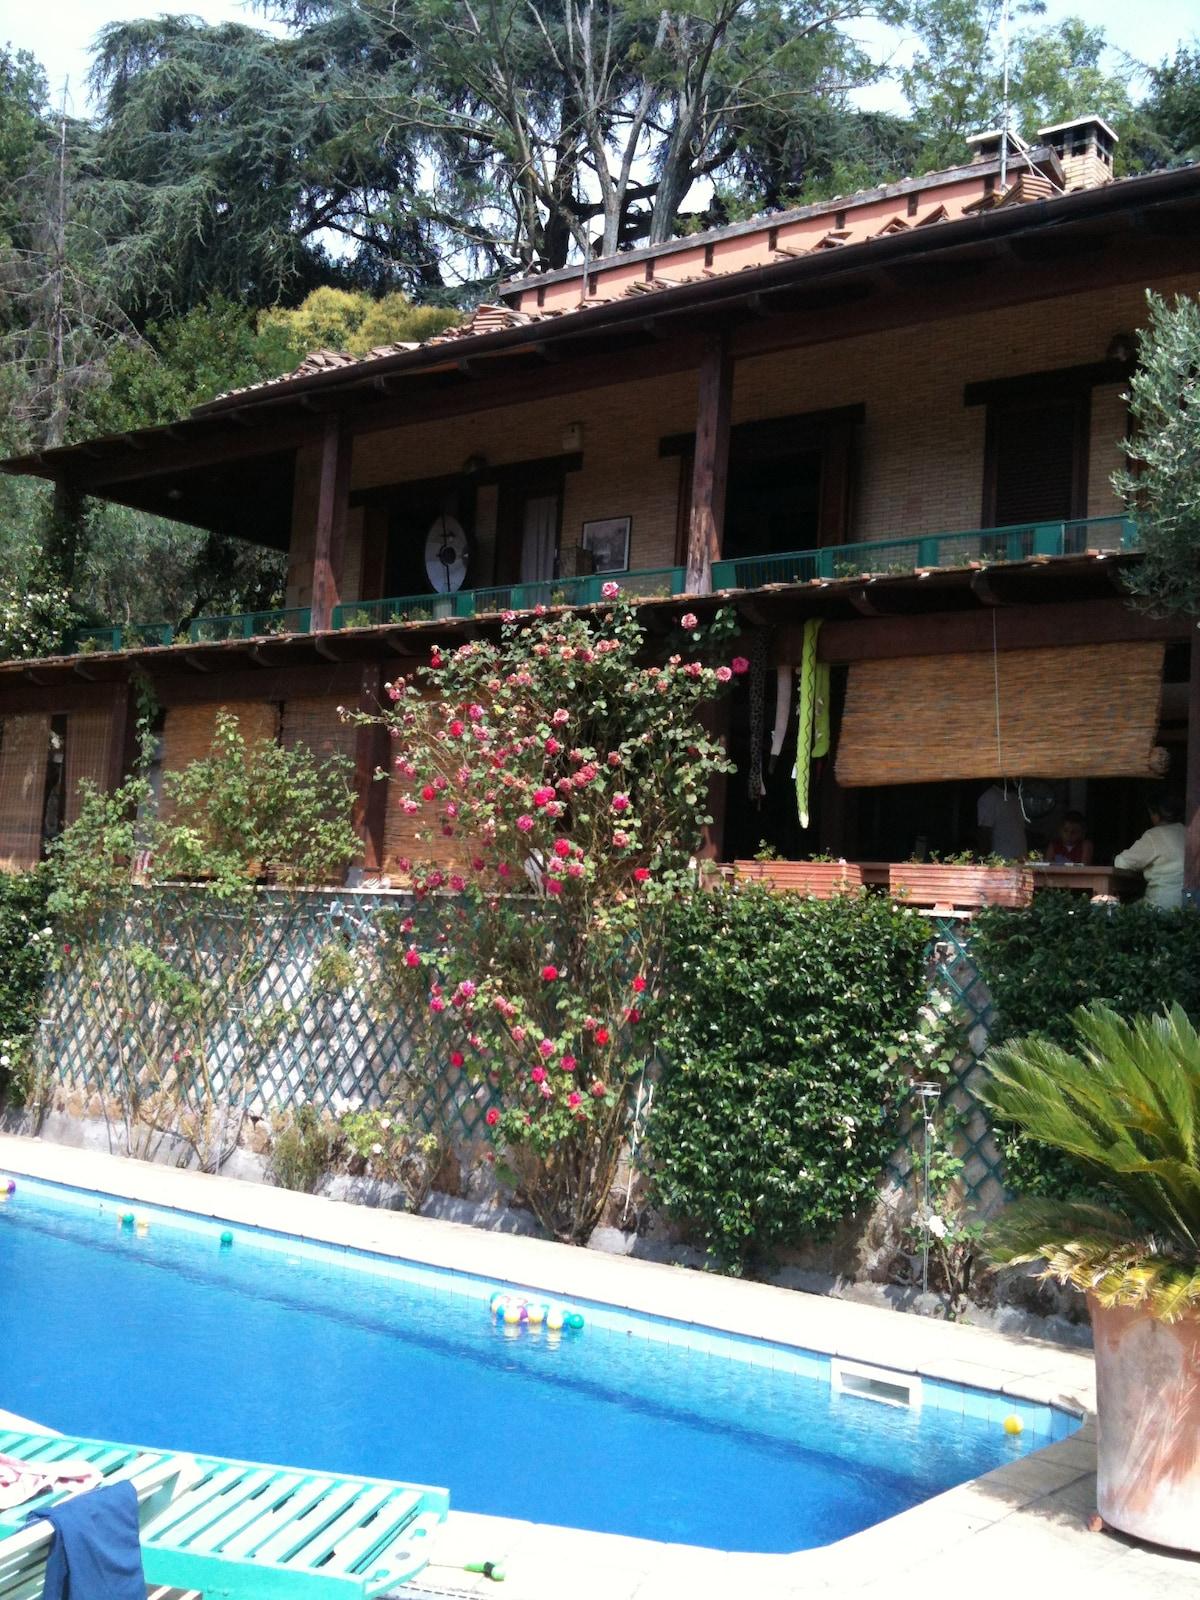 wonderful villa with pool an garden